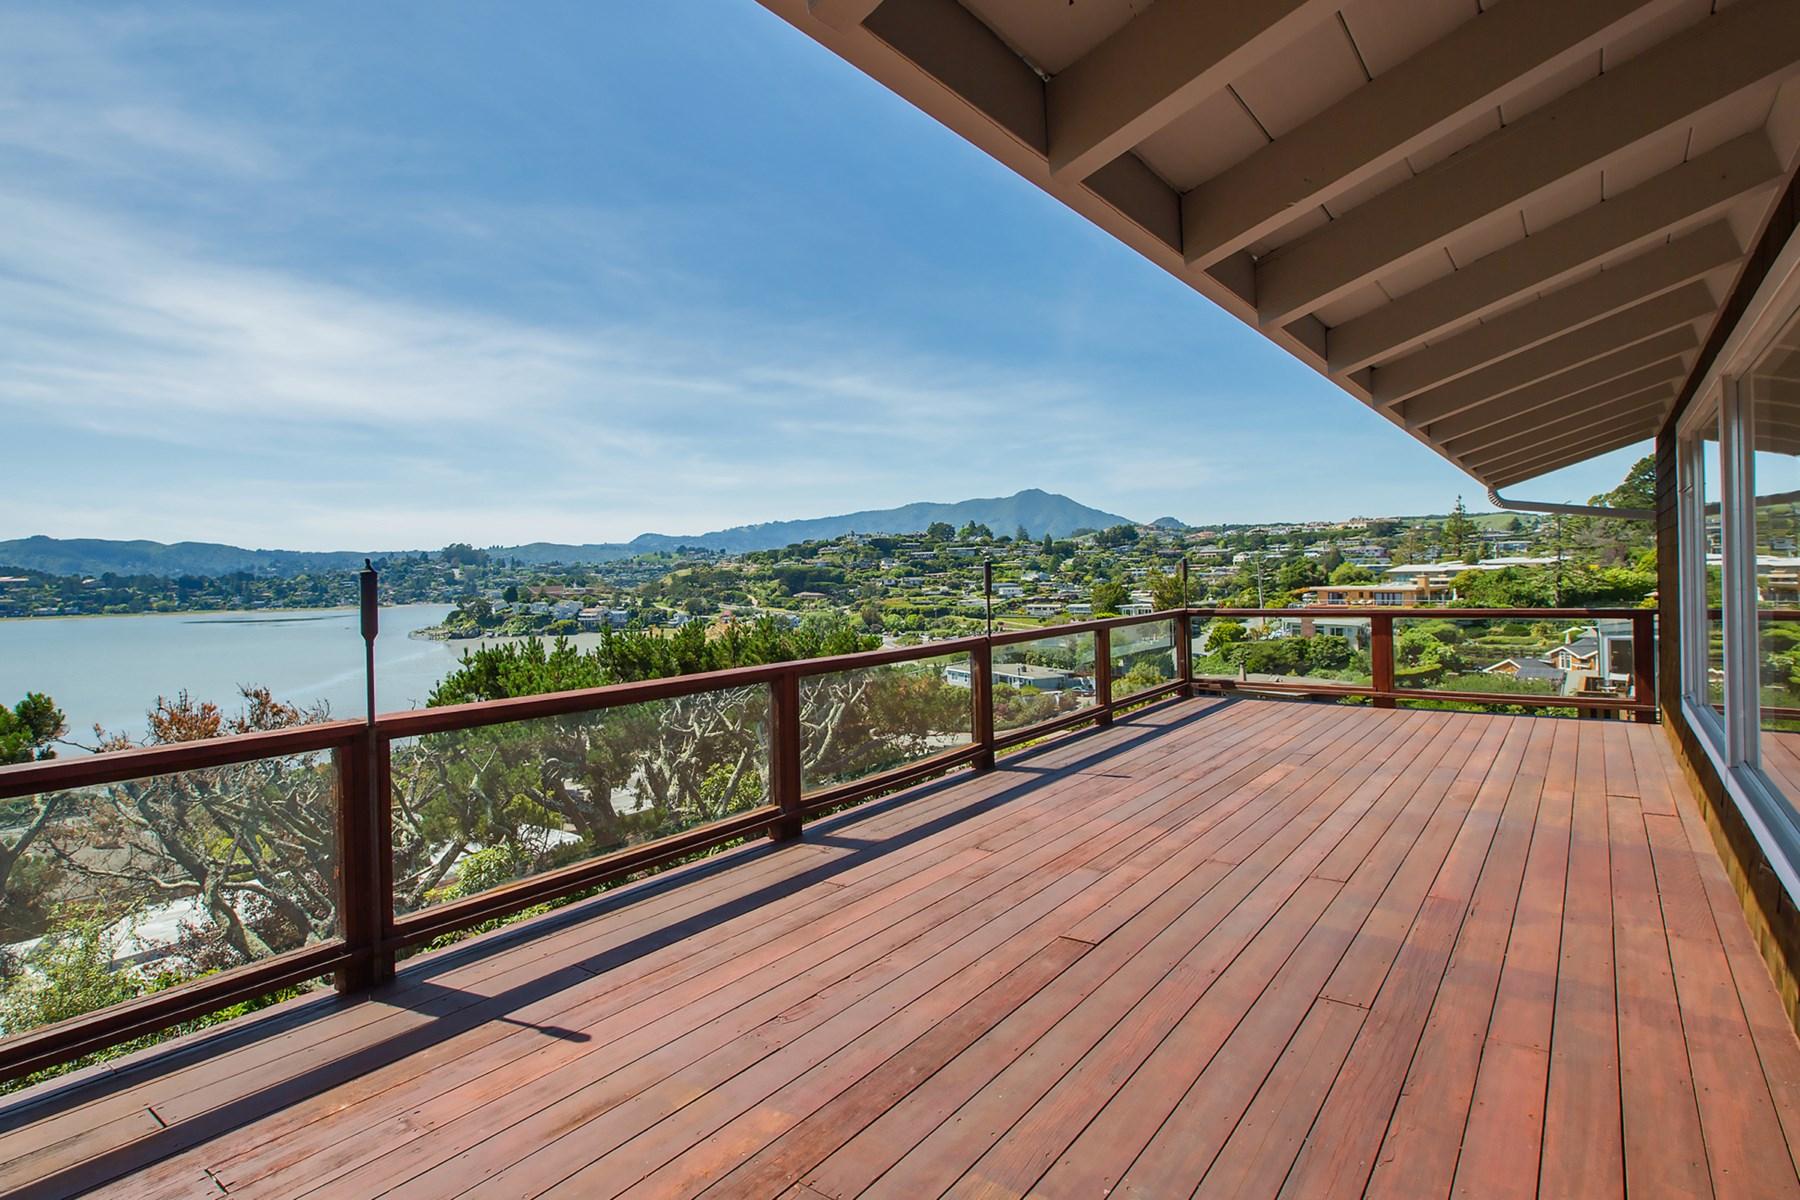 Vivienda unifamiliar por un Venta en Stunning Tiburon View Home 138 Stewart Dr Tiburon, California, 94920 Estados Unidos